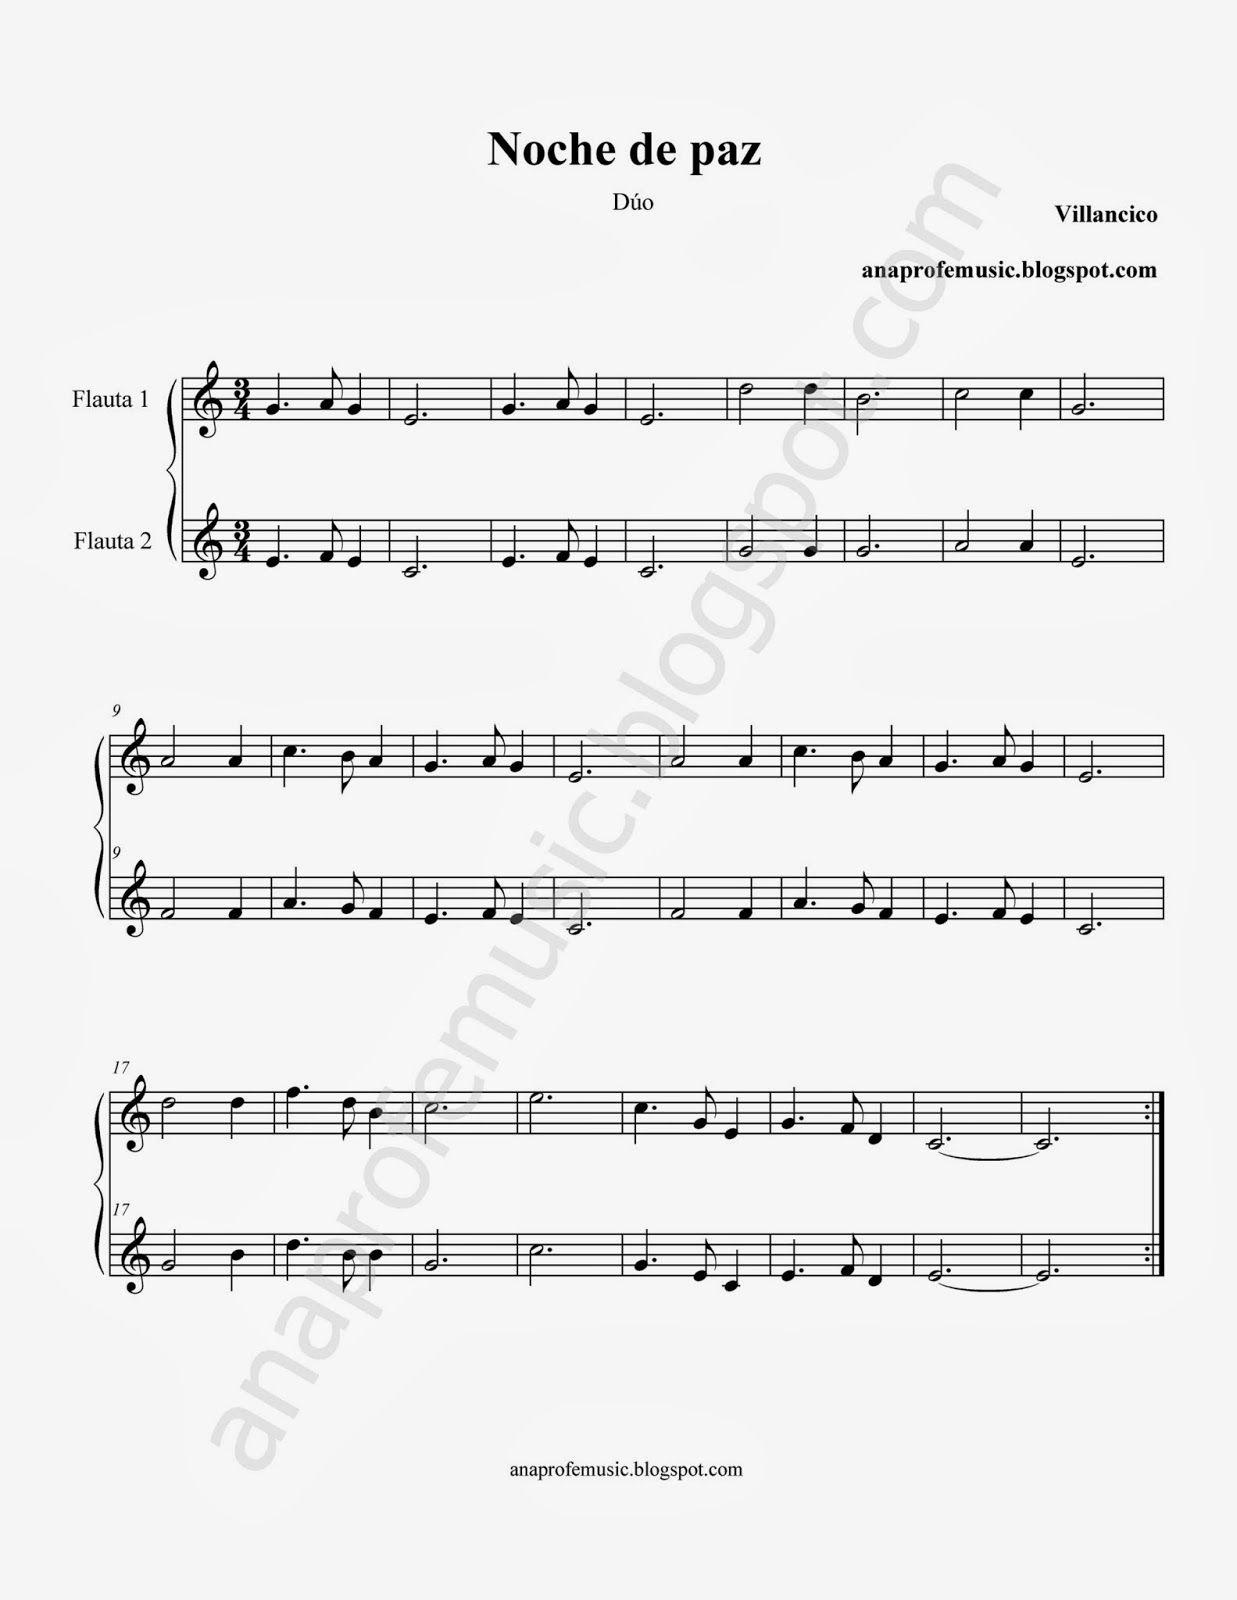 Partitura Duo Noche De Paz Flauta Tiff 1237 1600 Partituras Partituras Trompeta Partituras Piano Facil